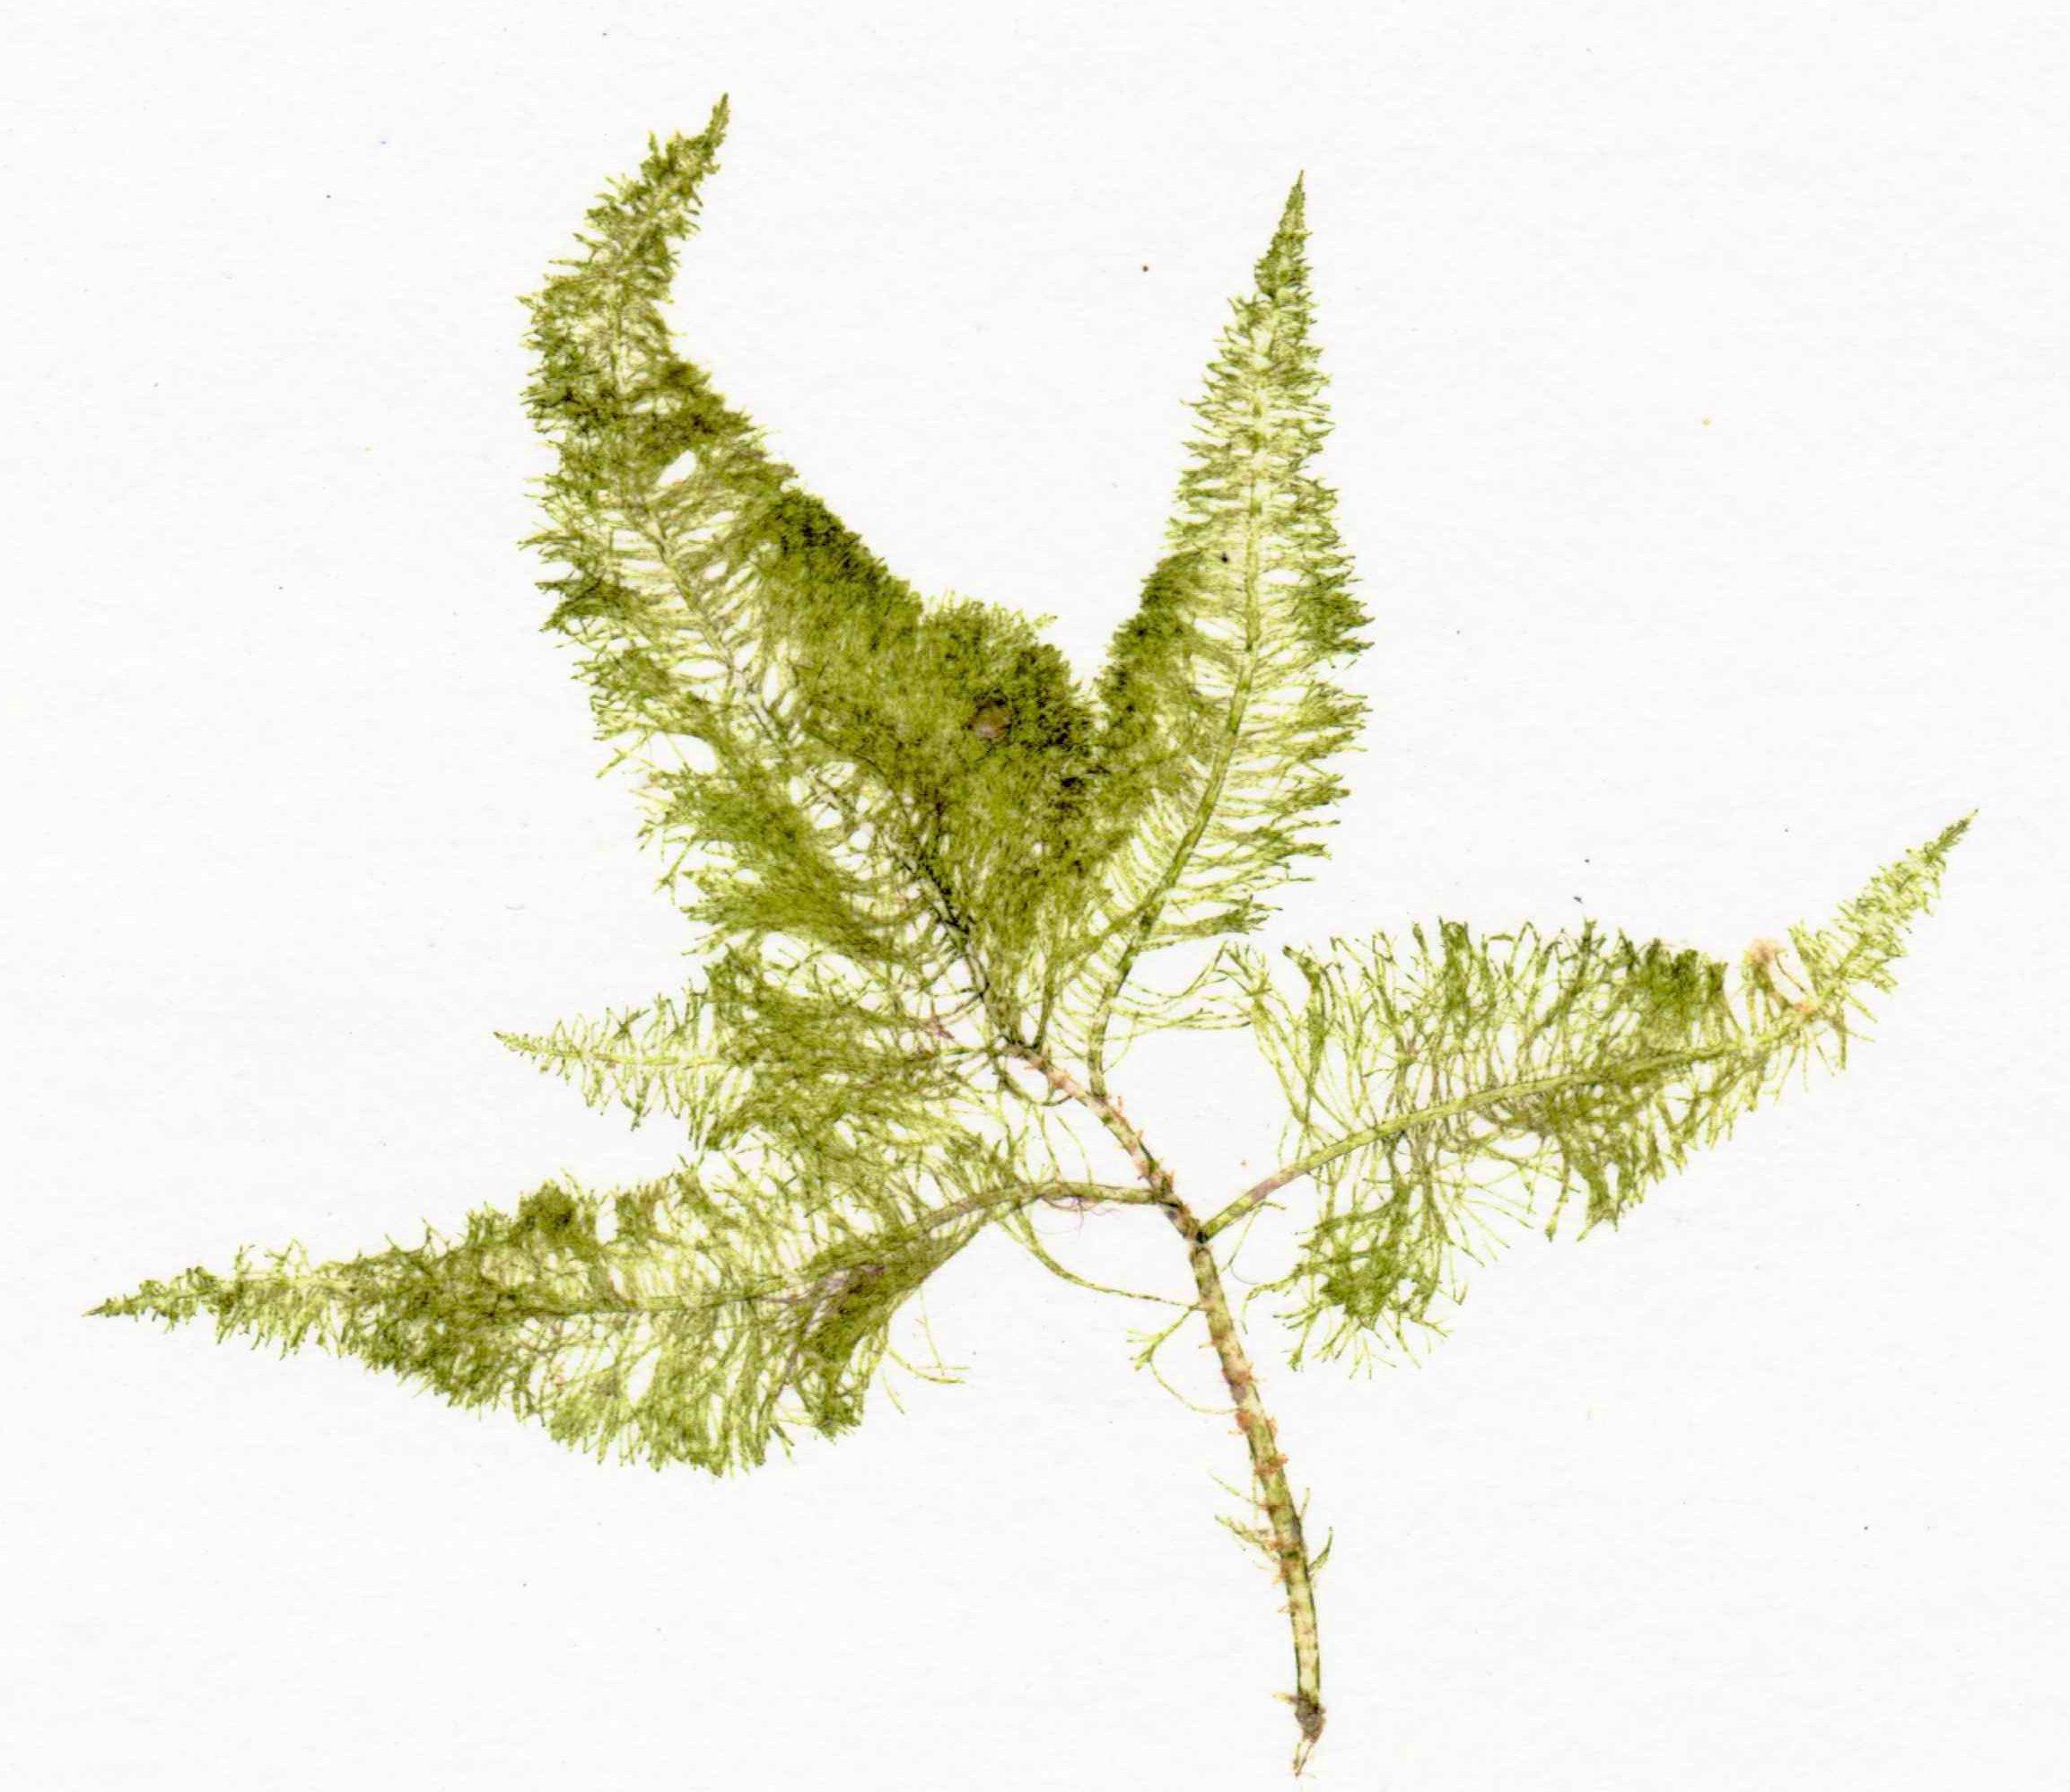 Bryopsis_plumosa_herbarium_item.jpg